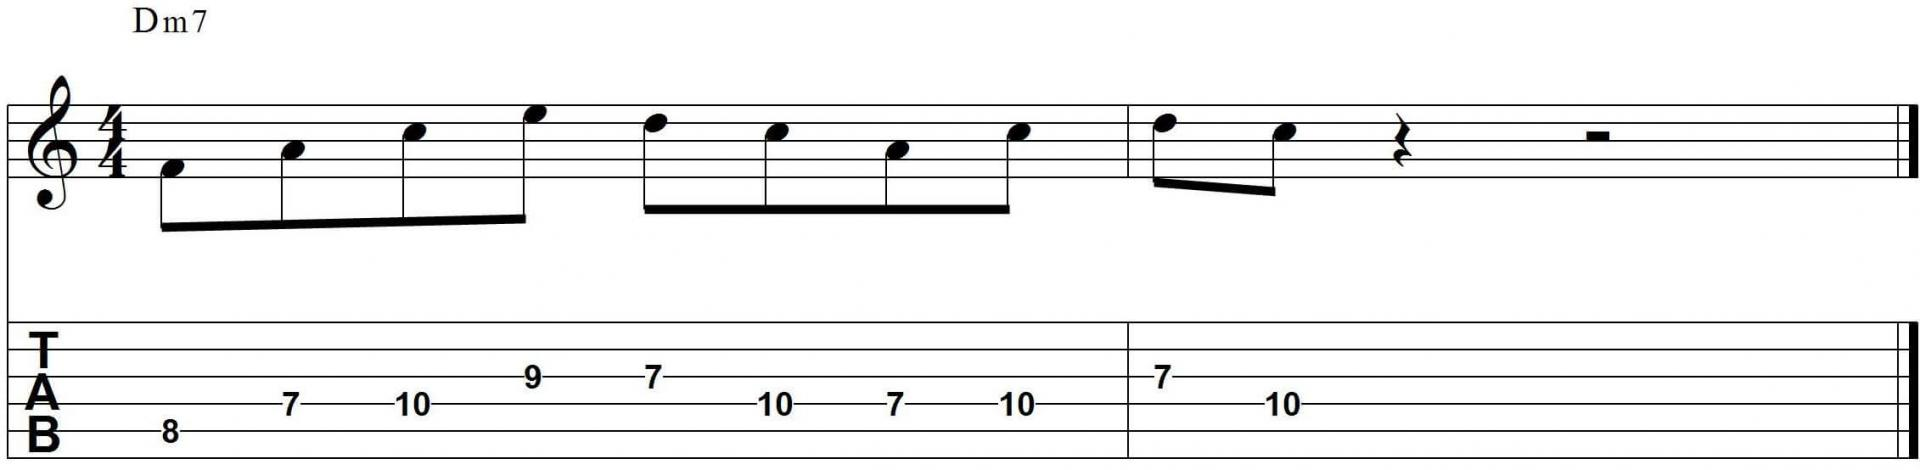 minor seventh jazz guitar pattern